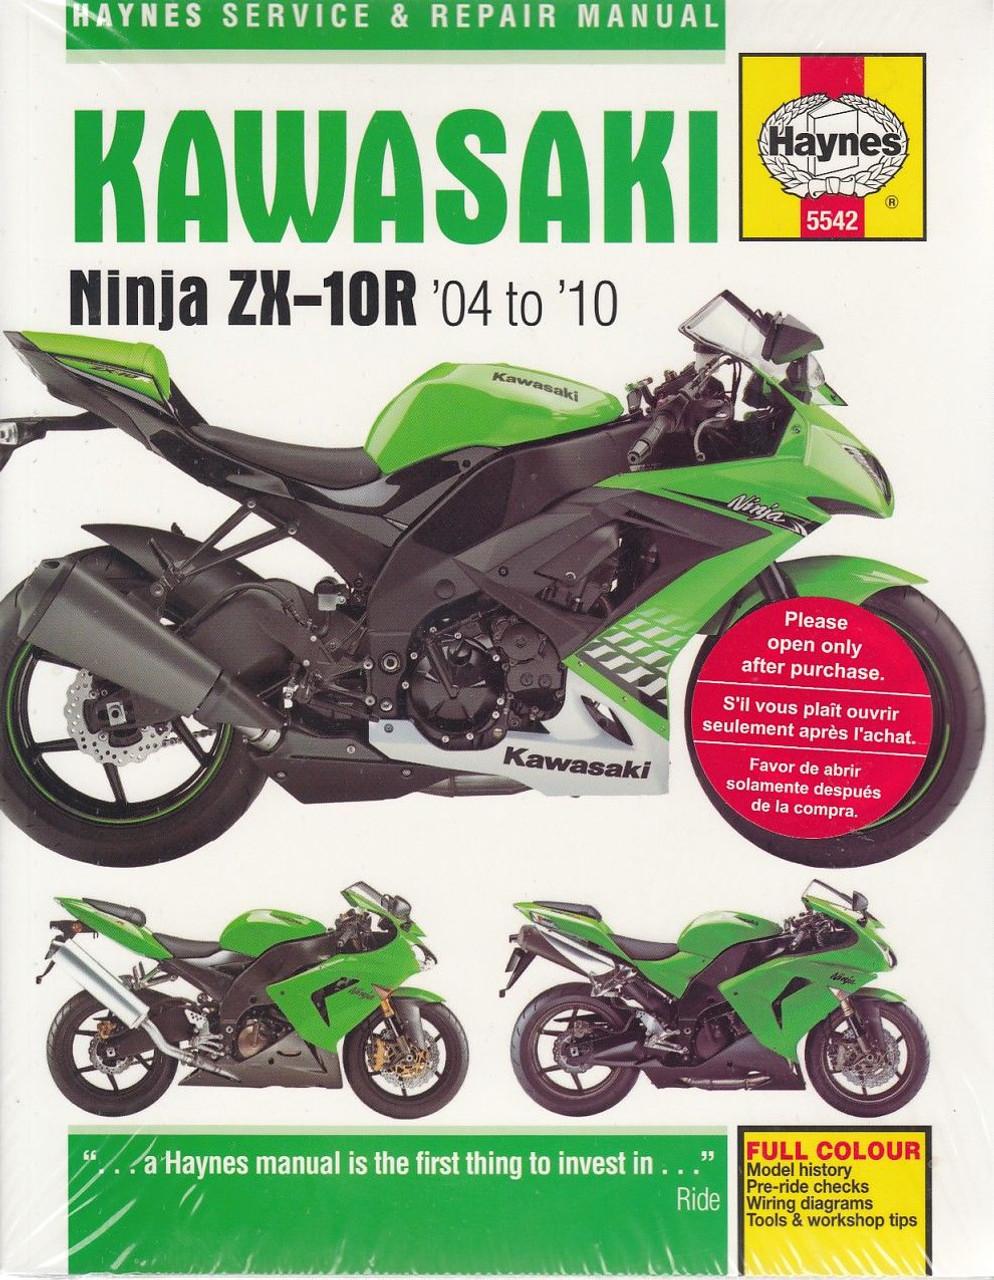 2006 Ex500 Wiring Diagram Library Kawasaki Diagrams Ninja Zx 10r 2004 2010 Workshop Manual Rh Automotobookshop Com Au Zx10r